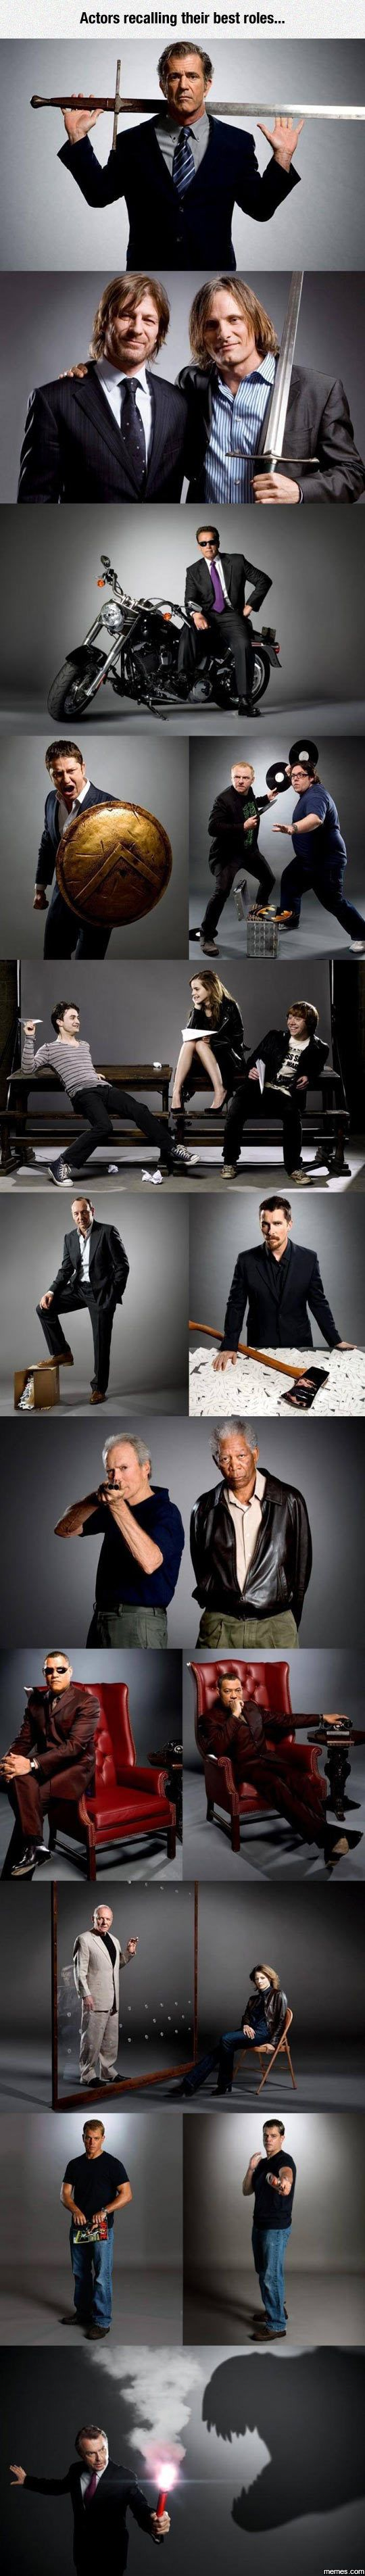 Actors Recalling Their Best Roles | Memes.com